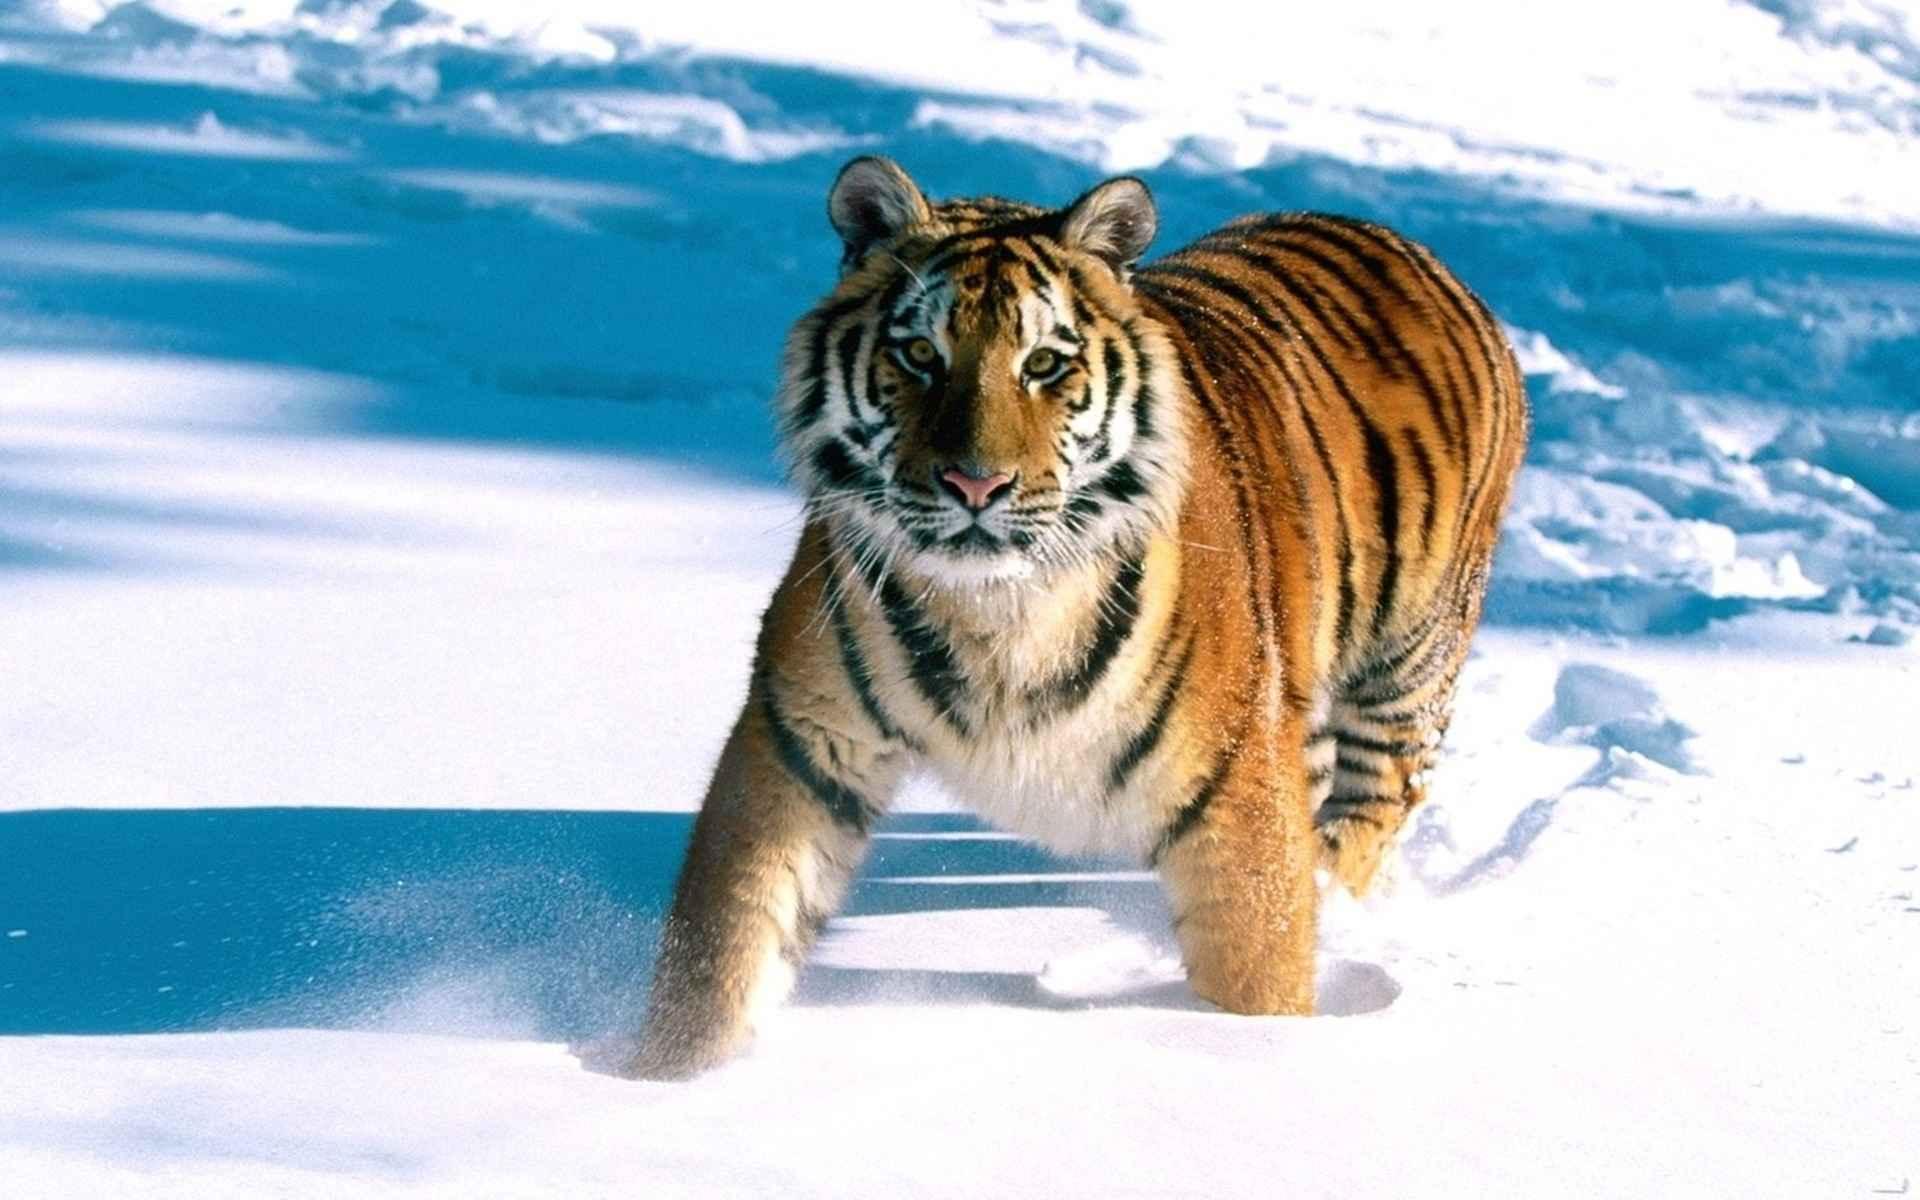 عکس منظره حیوانات